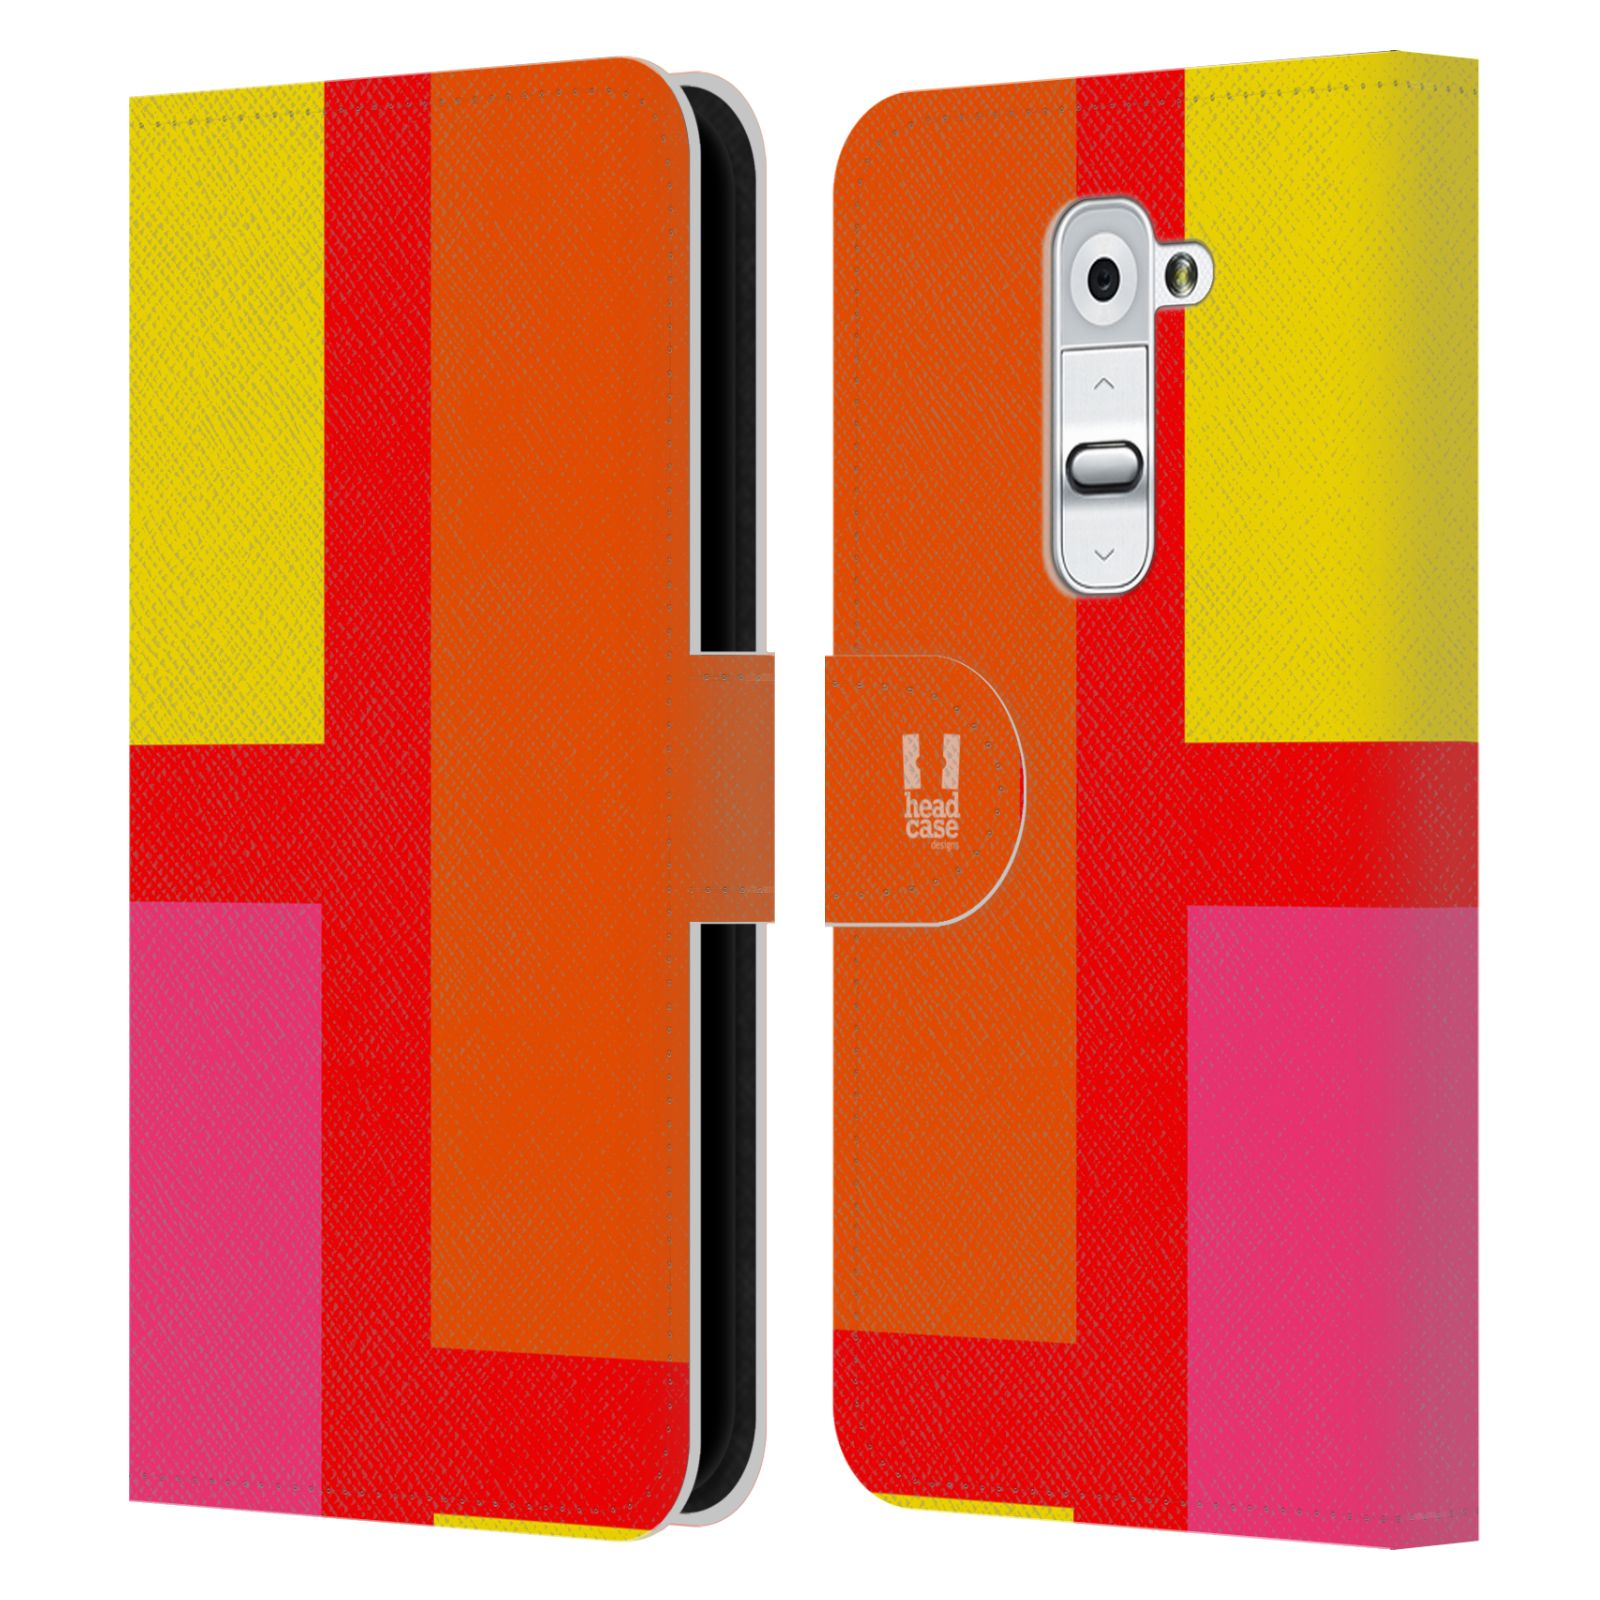 HEAD CASE Flipové pouzdro pro mobil LG G2 barevné tvary oranžová ulice